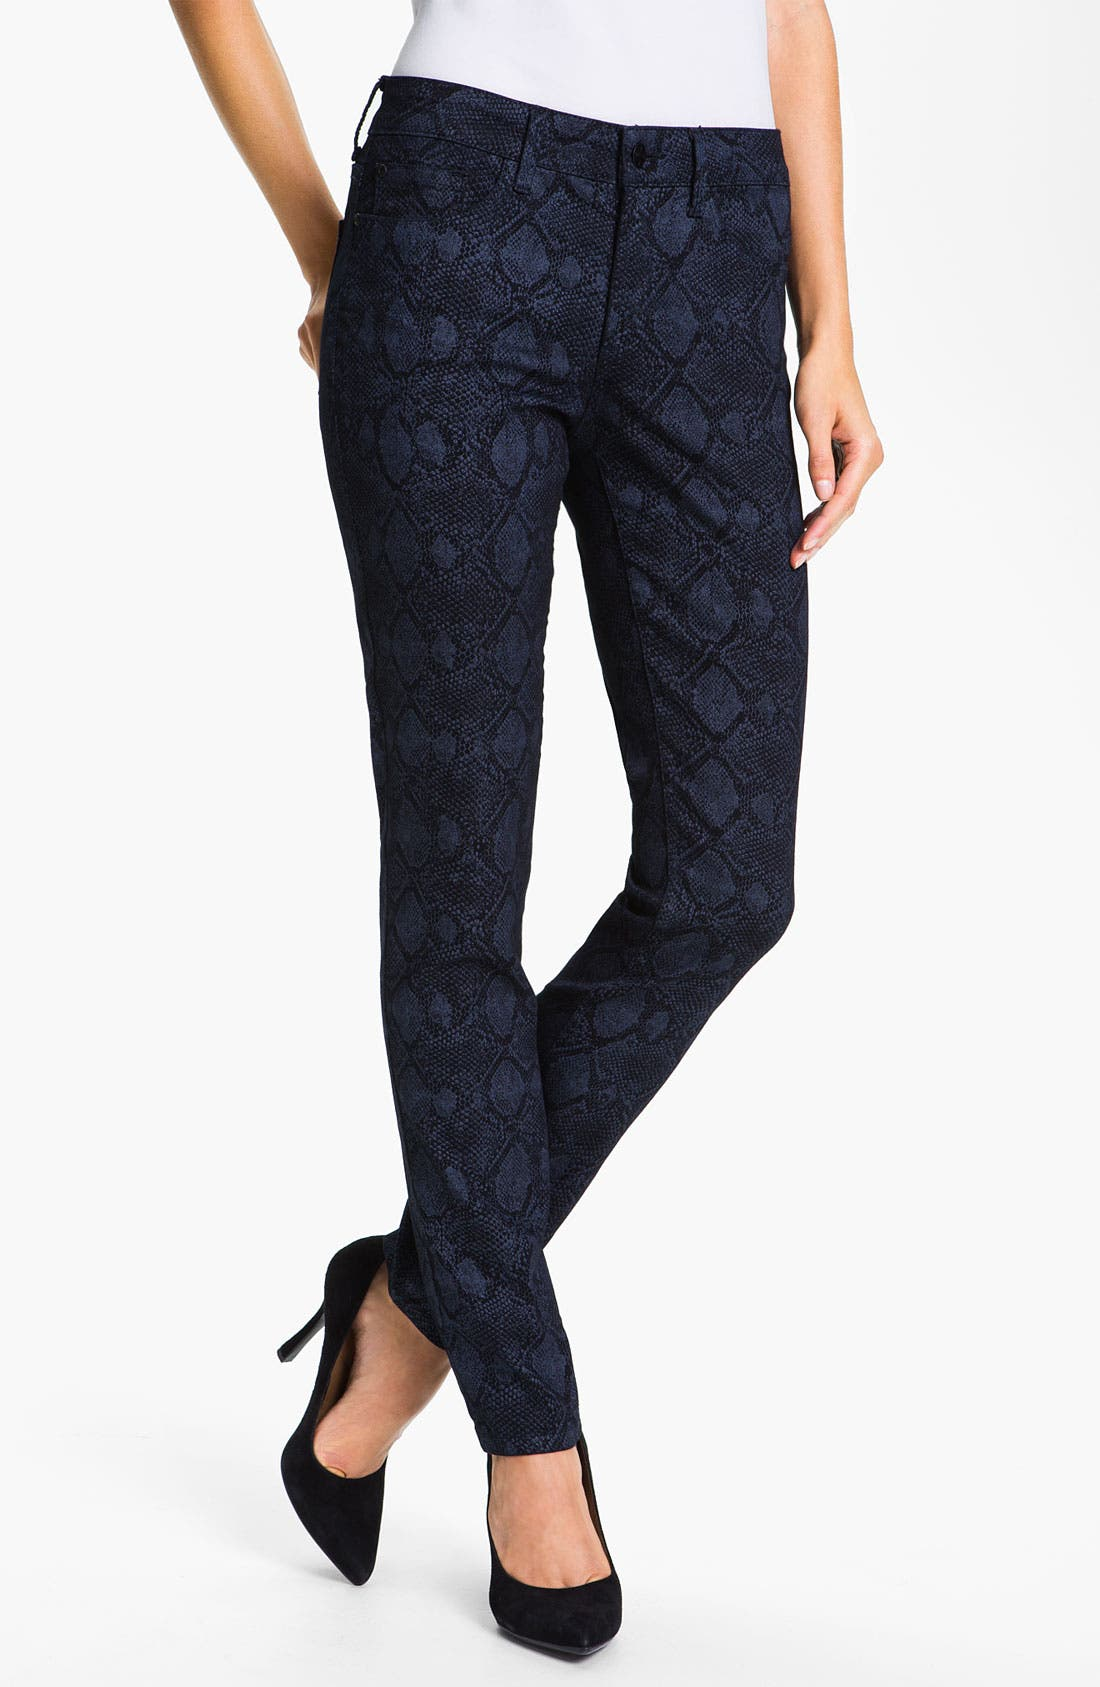 Alternate Image 1 Selected - NYDJ 'Sheri' Metallic Print Skinny Twill Jeans